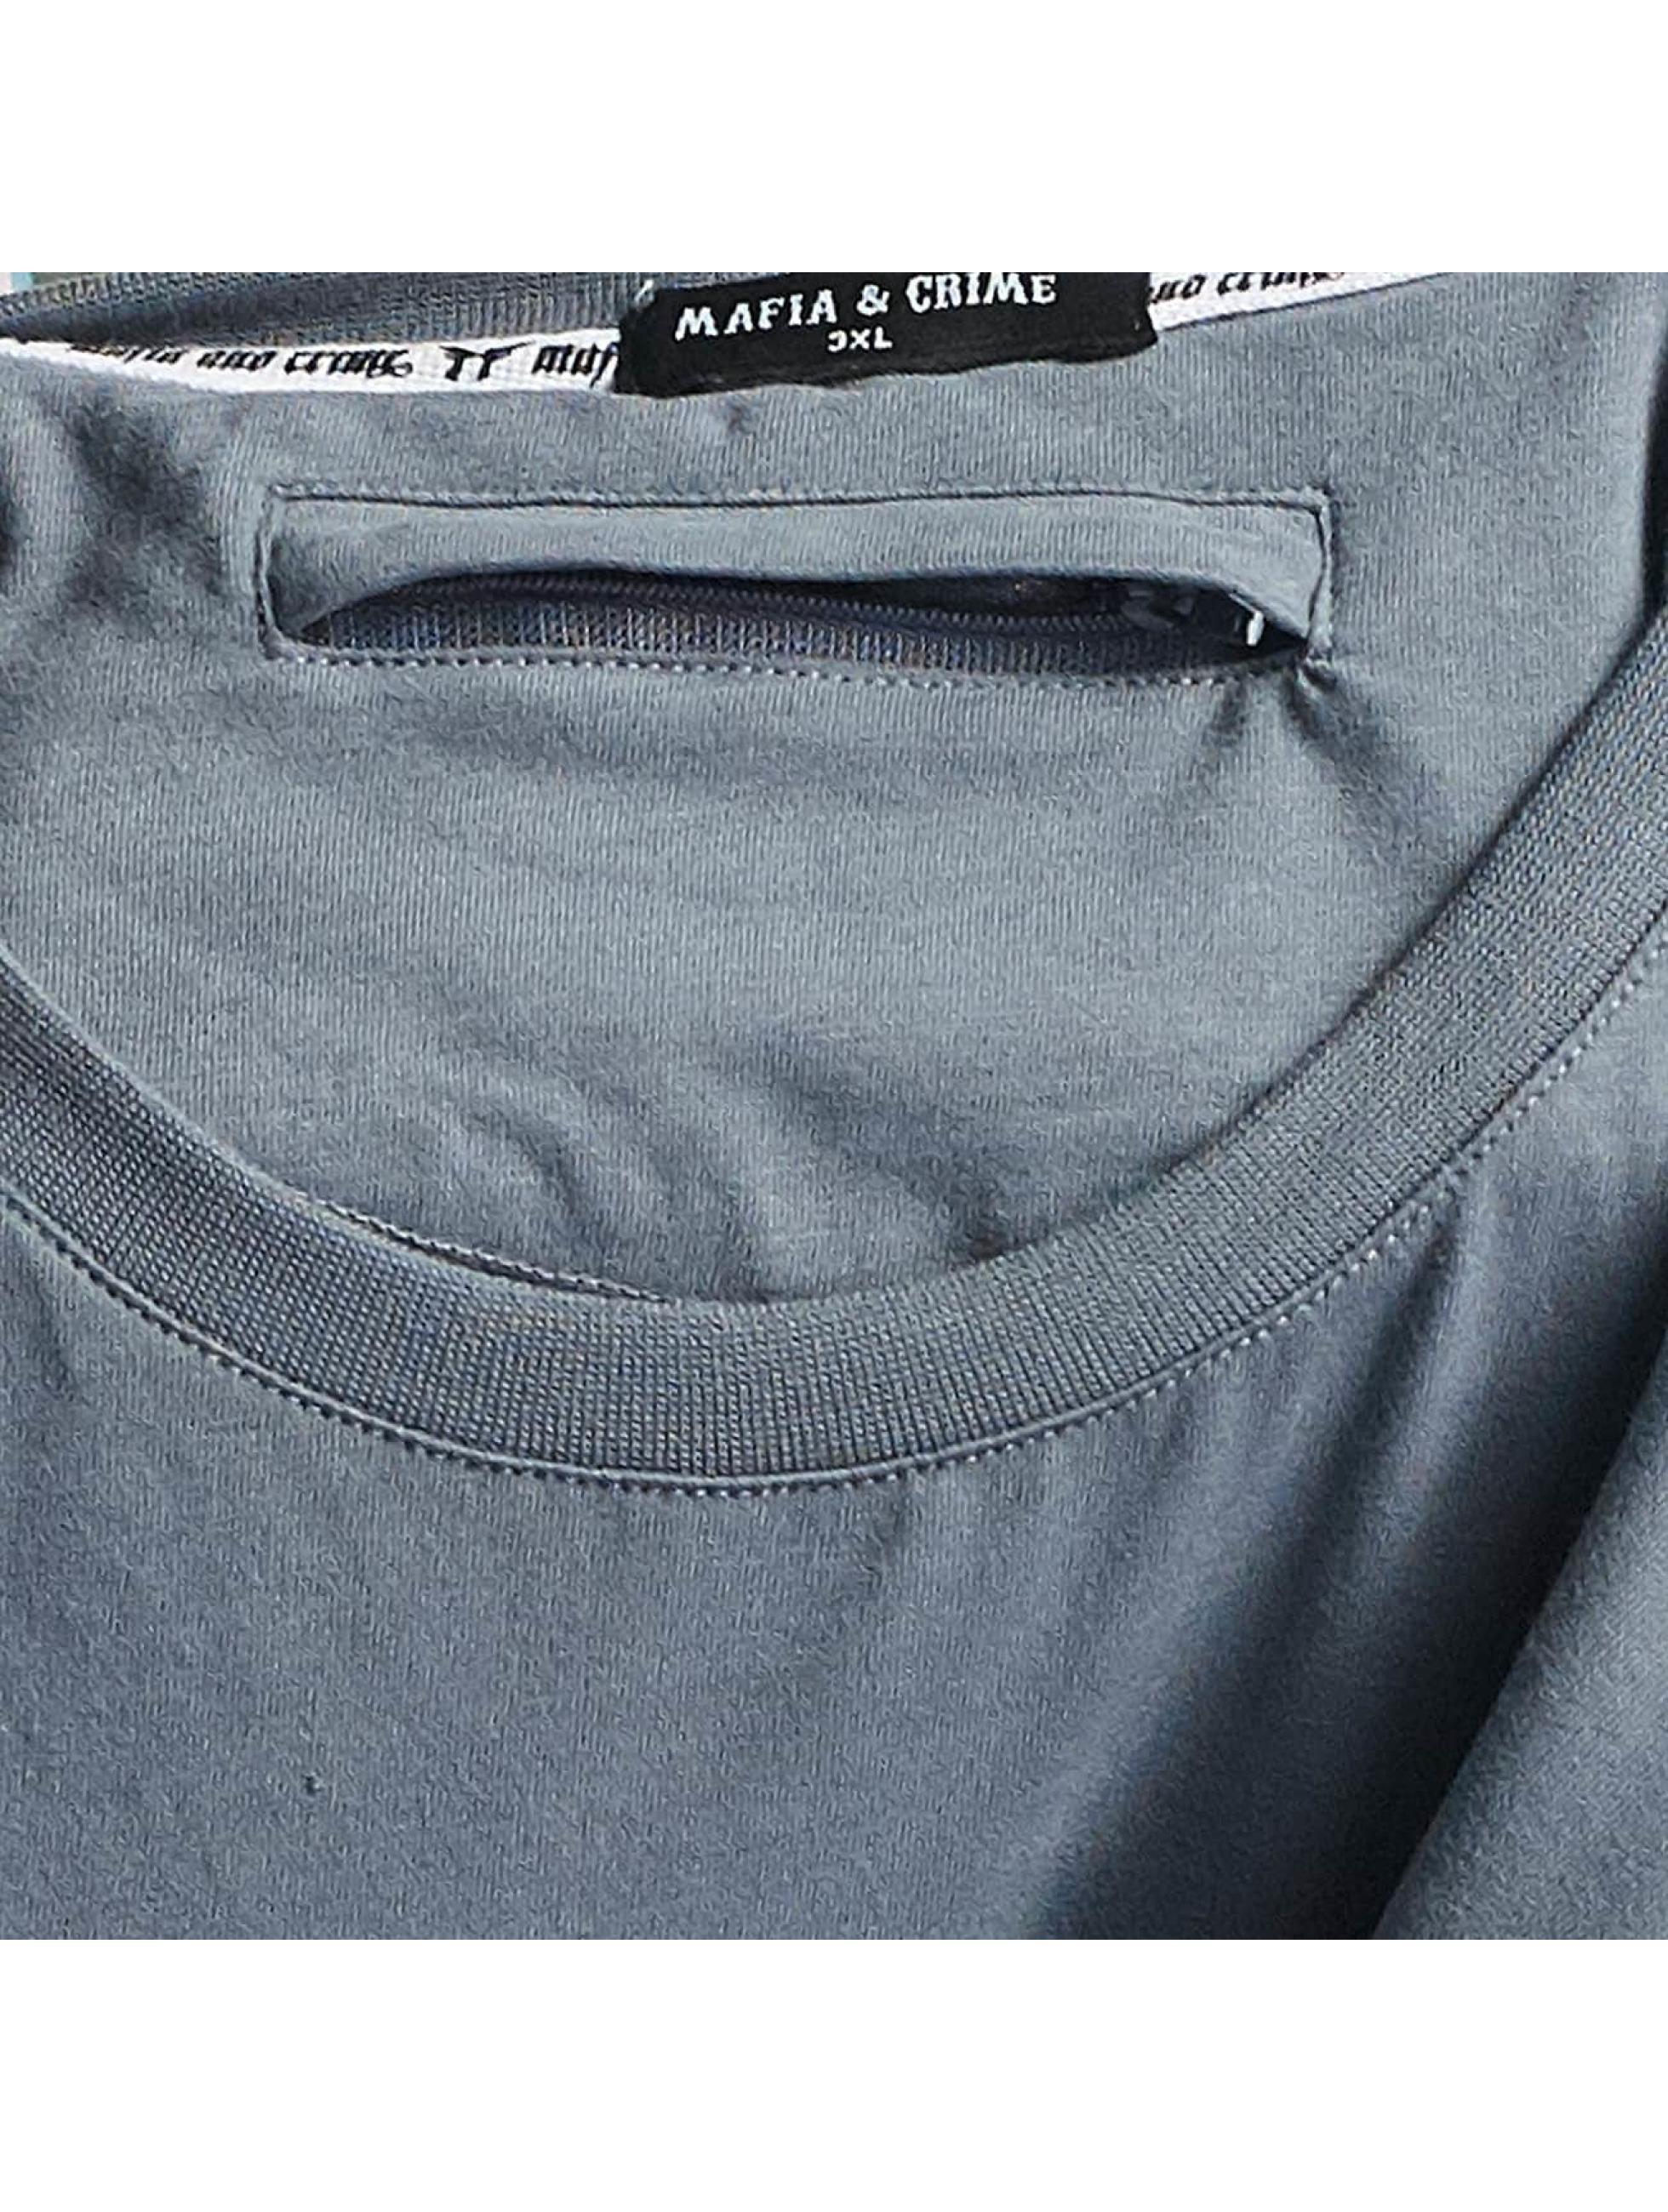 Mafia & Crime T-Shirt MC182 grau